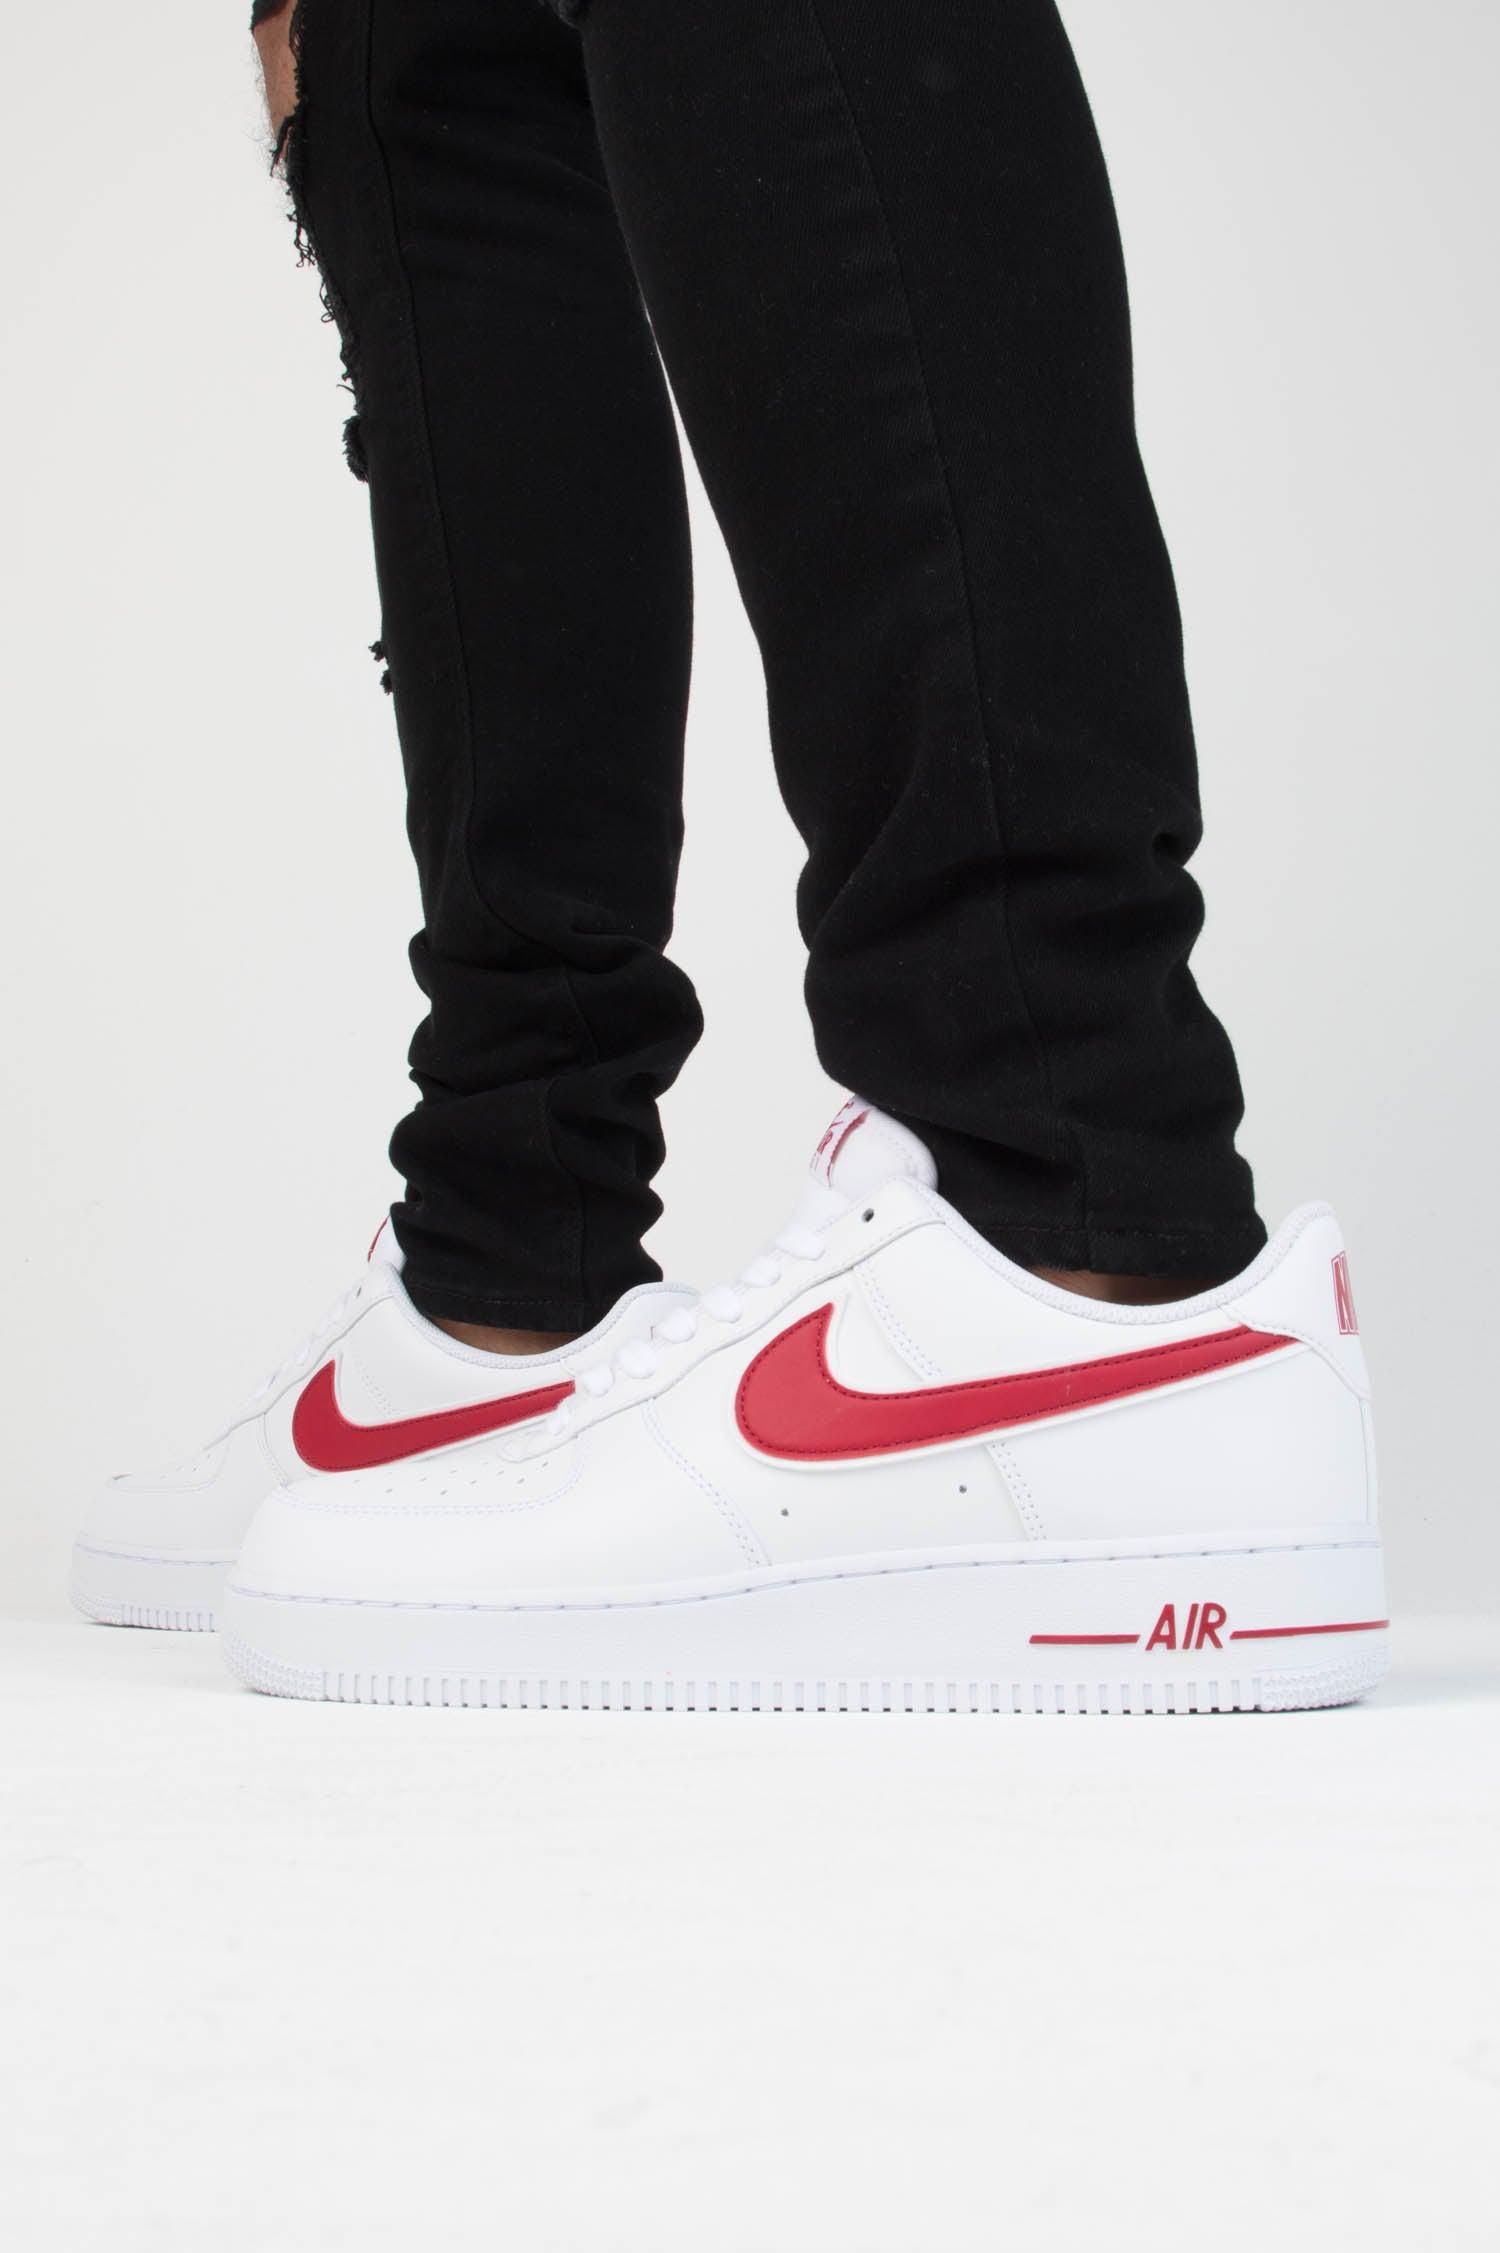 Nike Air Force 1 '07 3 WhiteRed